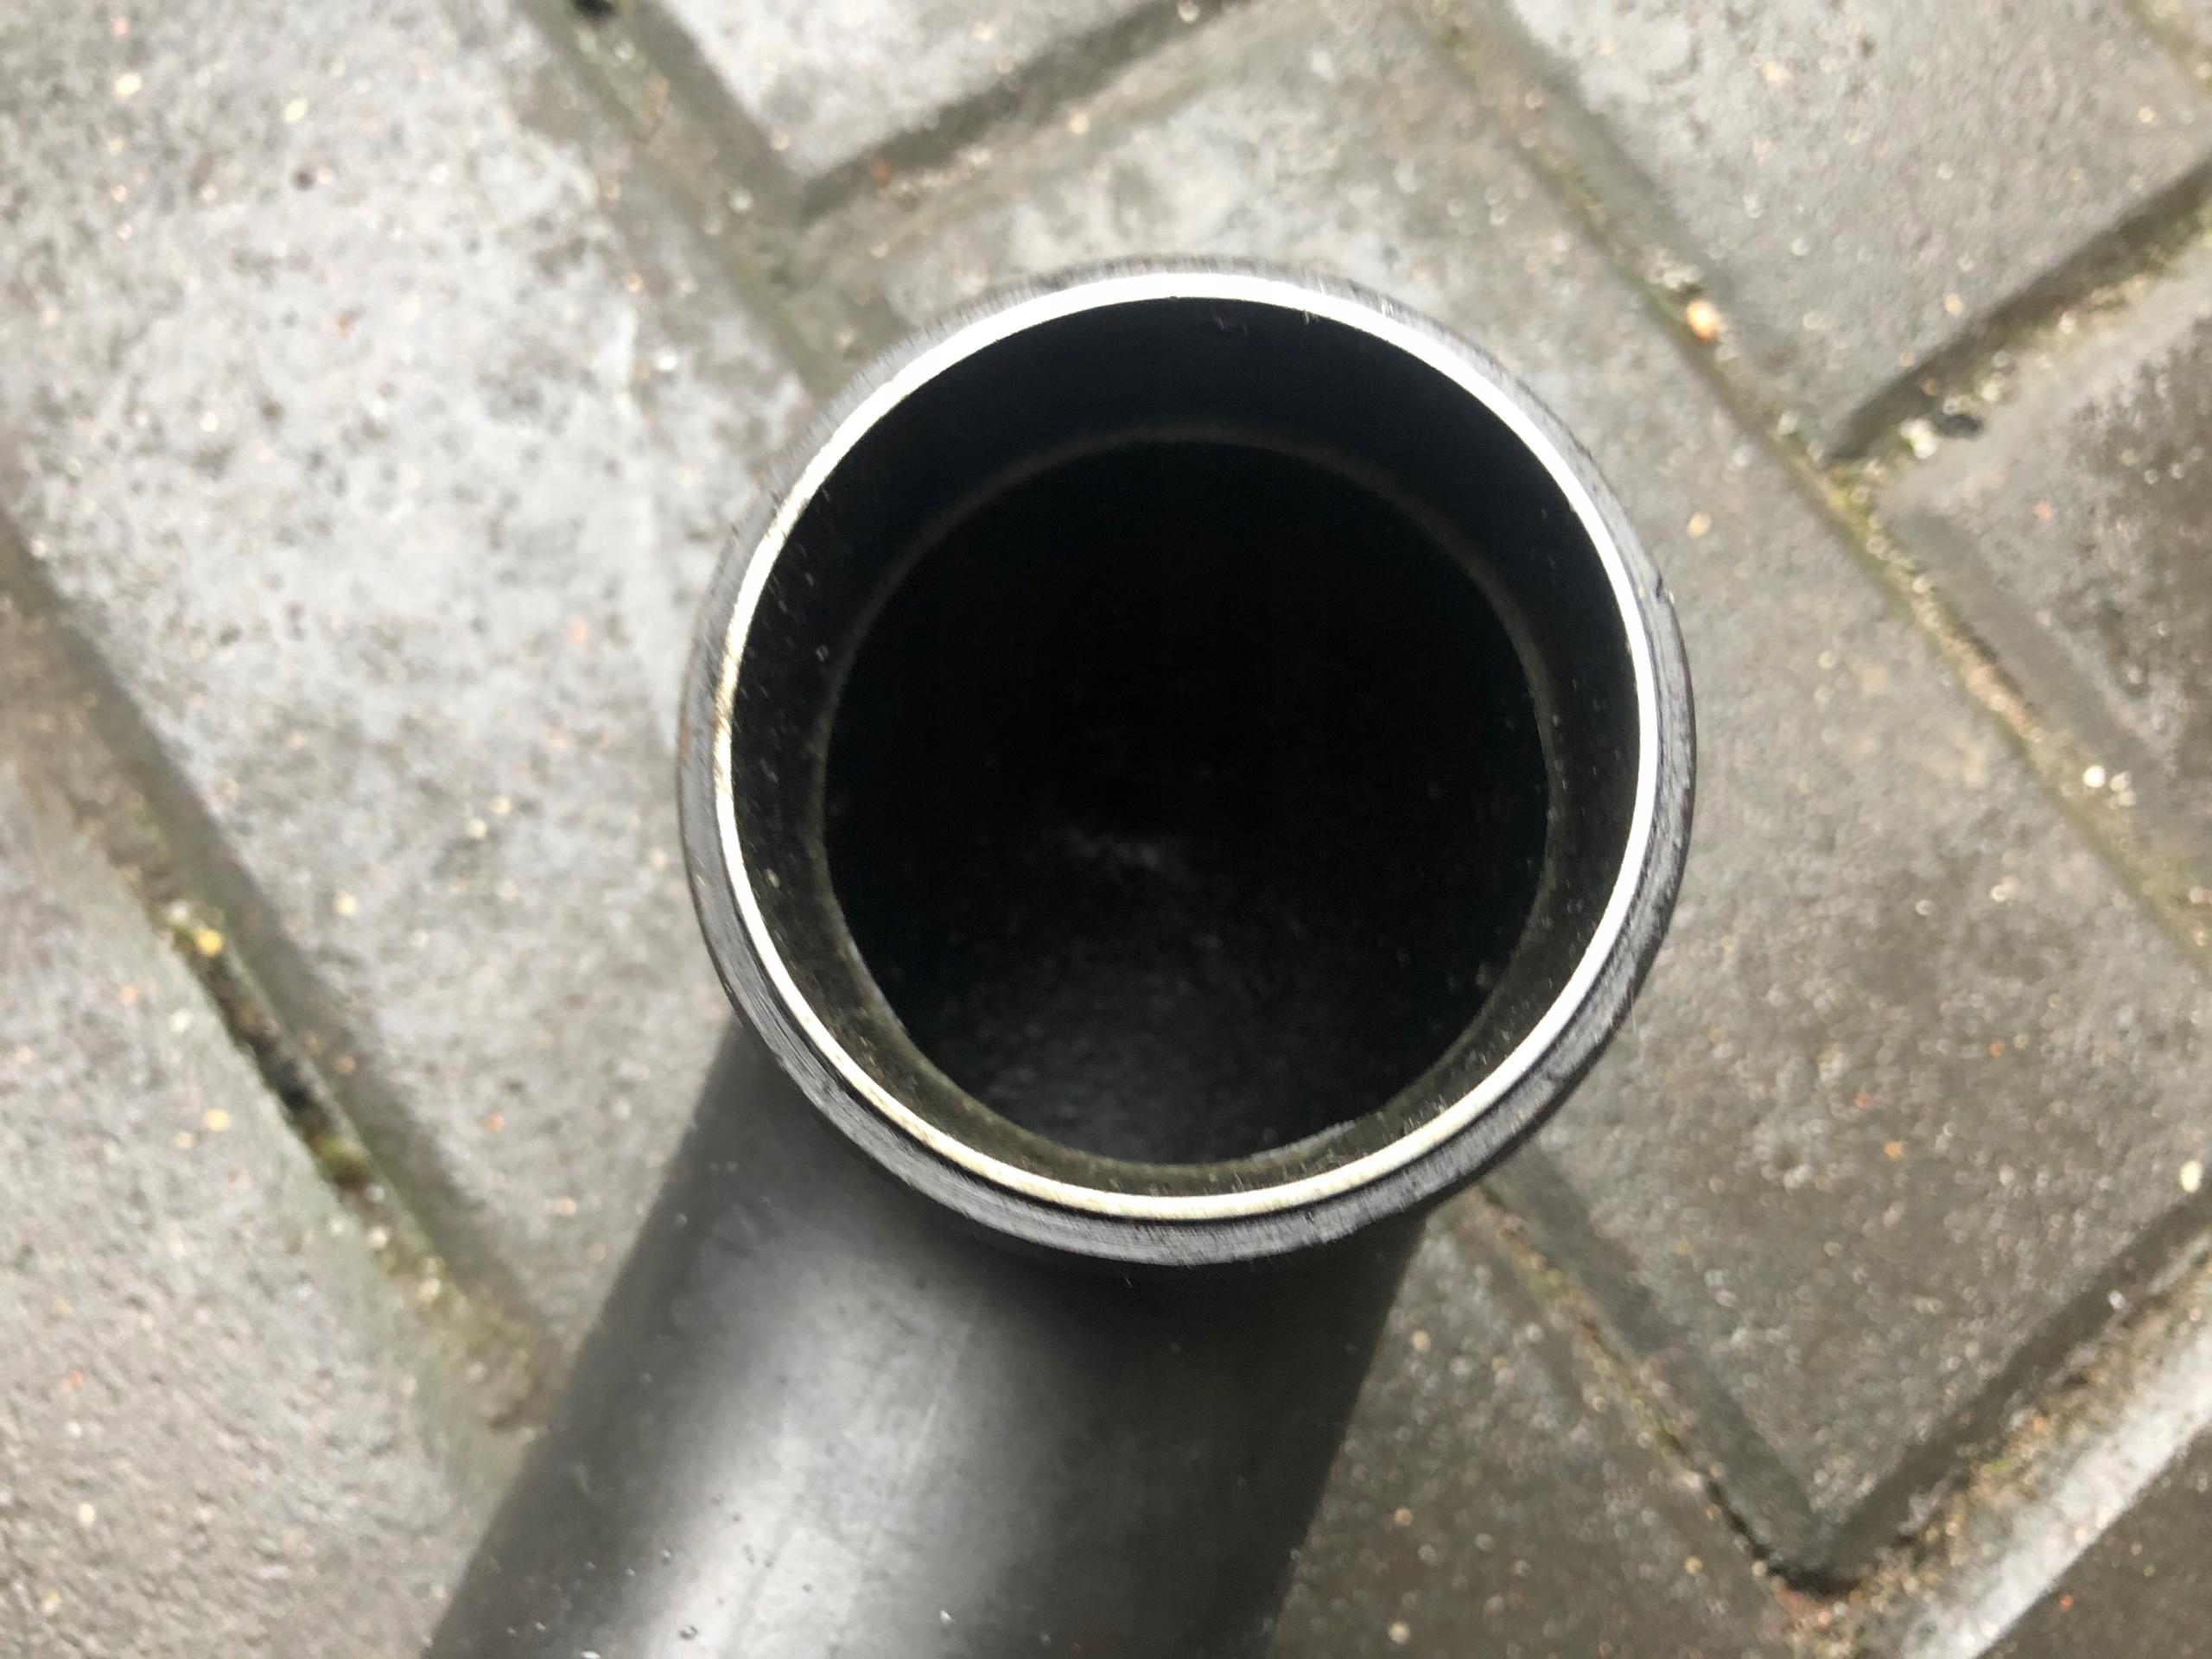 RURA DOLOT PRZEWÓD AUDI VW SEAT SKODA 1.9 TDI 9